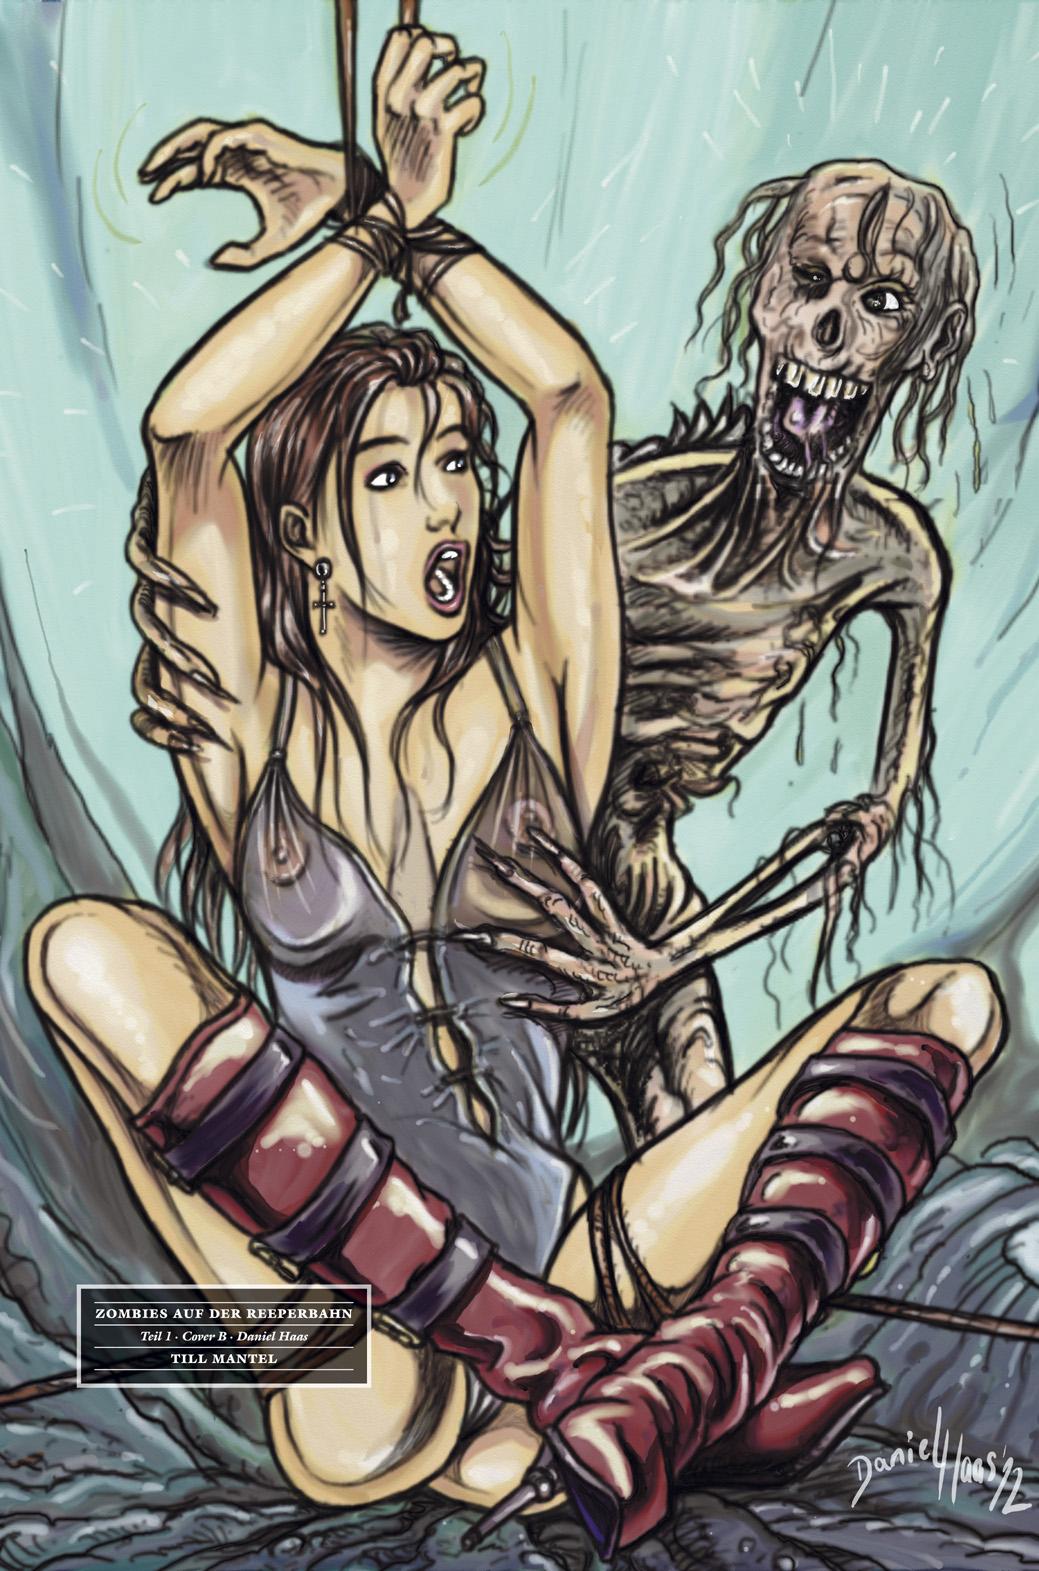 Till Mantel Zombies auf der Reeperbahn 1 Cover B Danile Haas